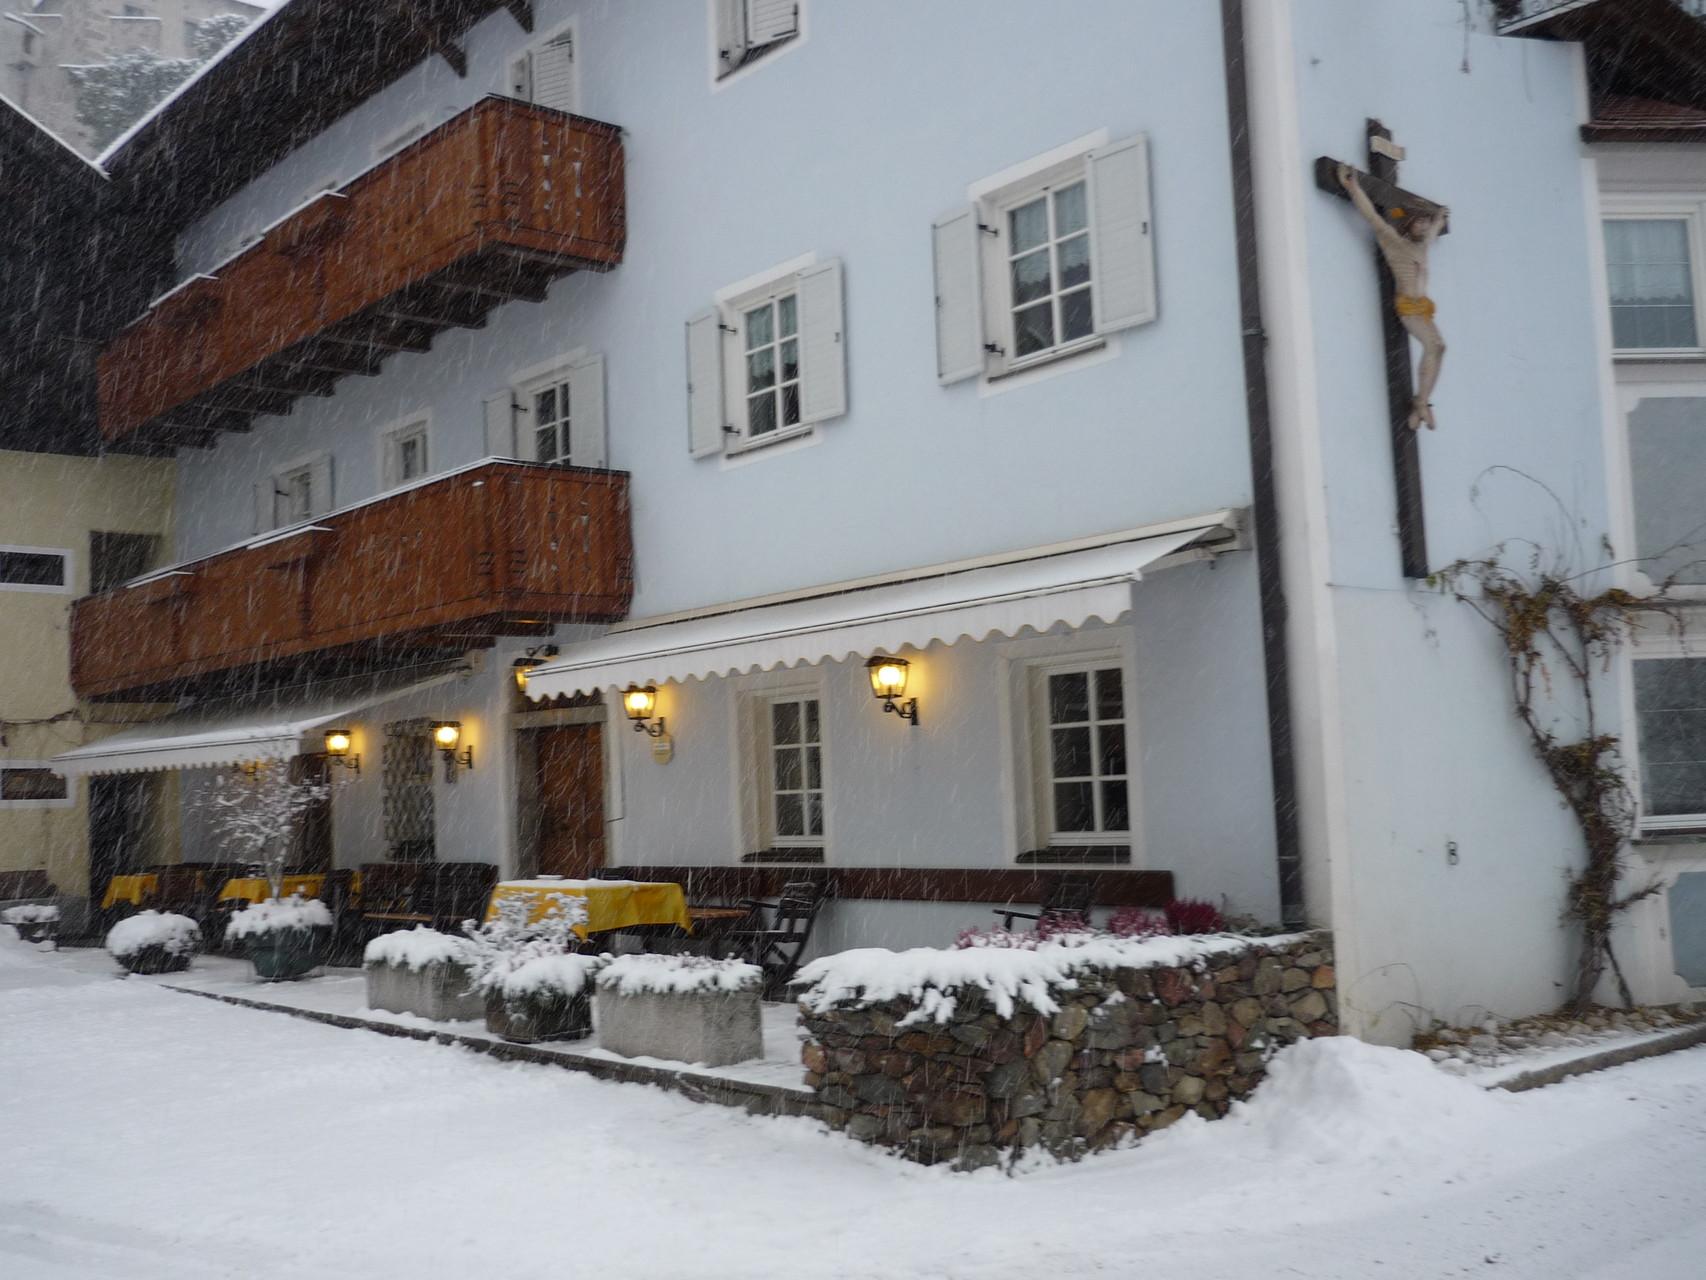 Albergo Obermair Casteldarne Chienes Val pusteria Alto Adige Sudtirolo Hotel